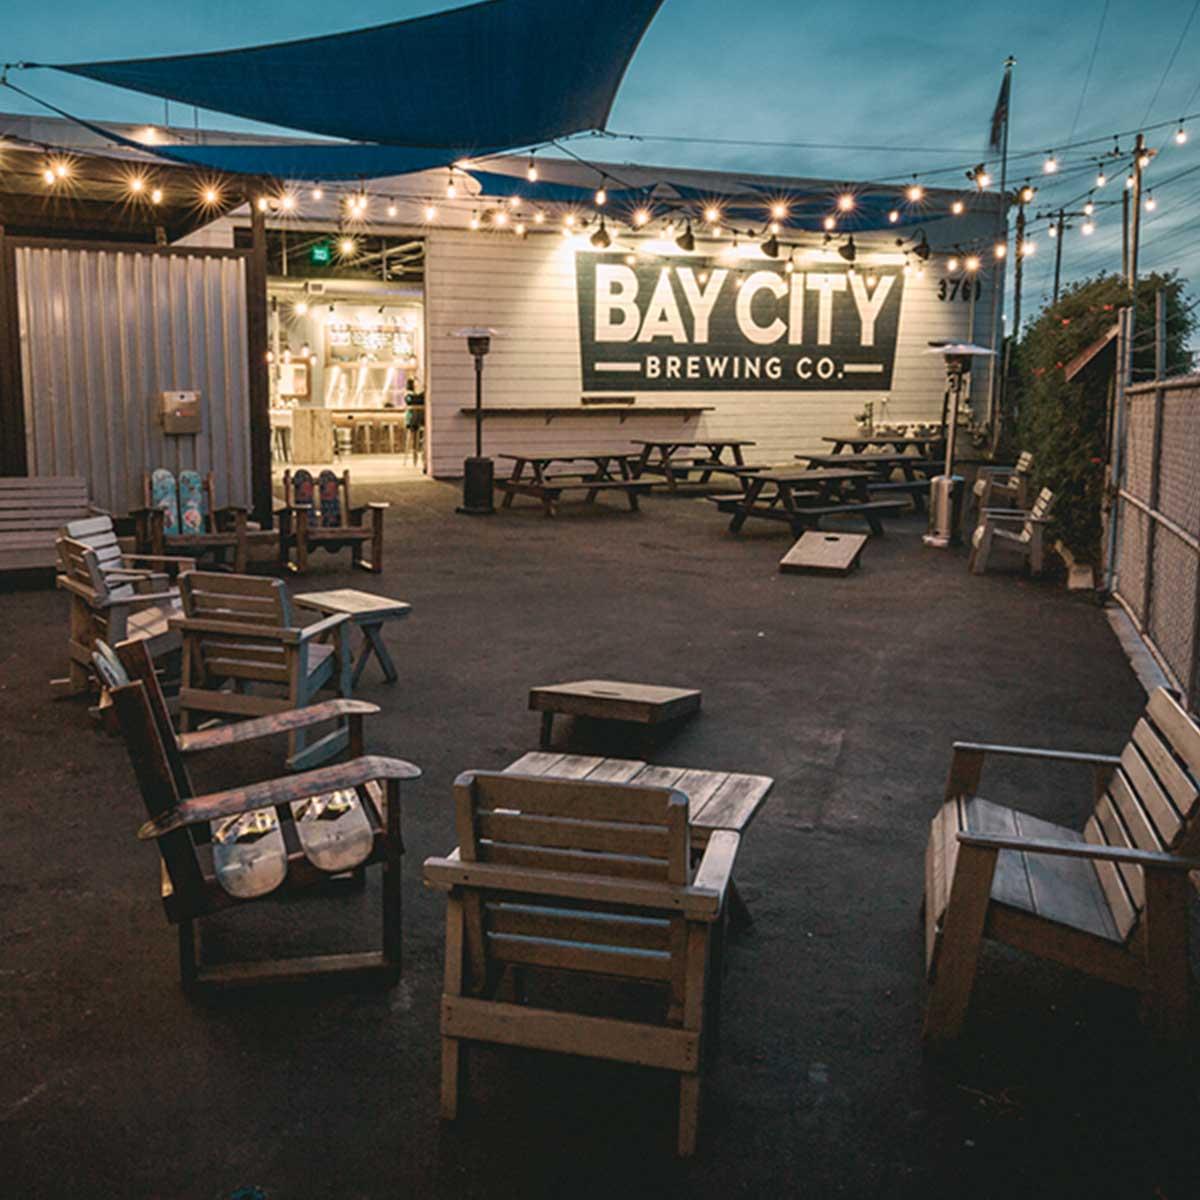 https://baycitybrewingco.com/wp-content/uploads/2019/02/patio_2x.jpg